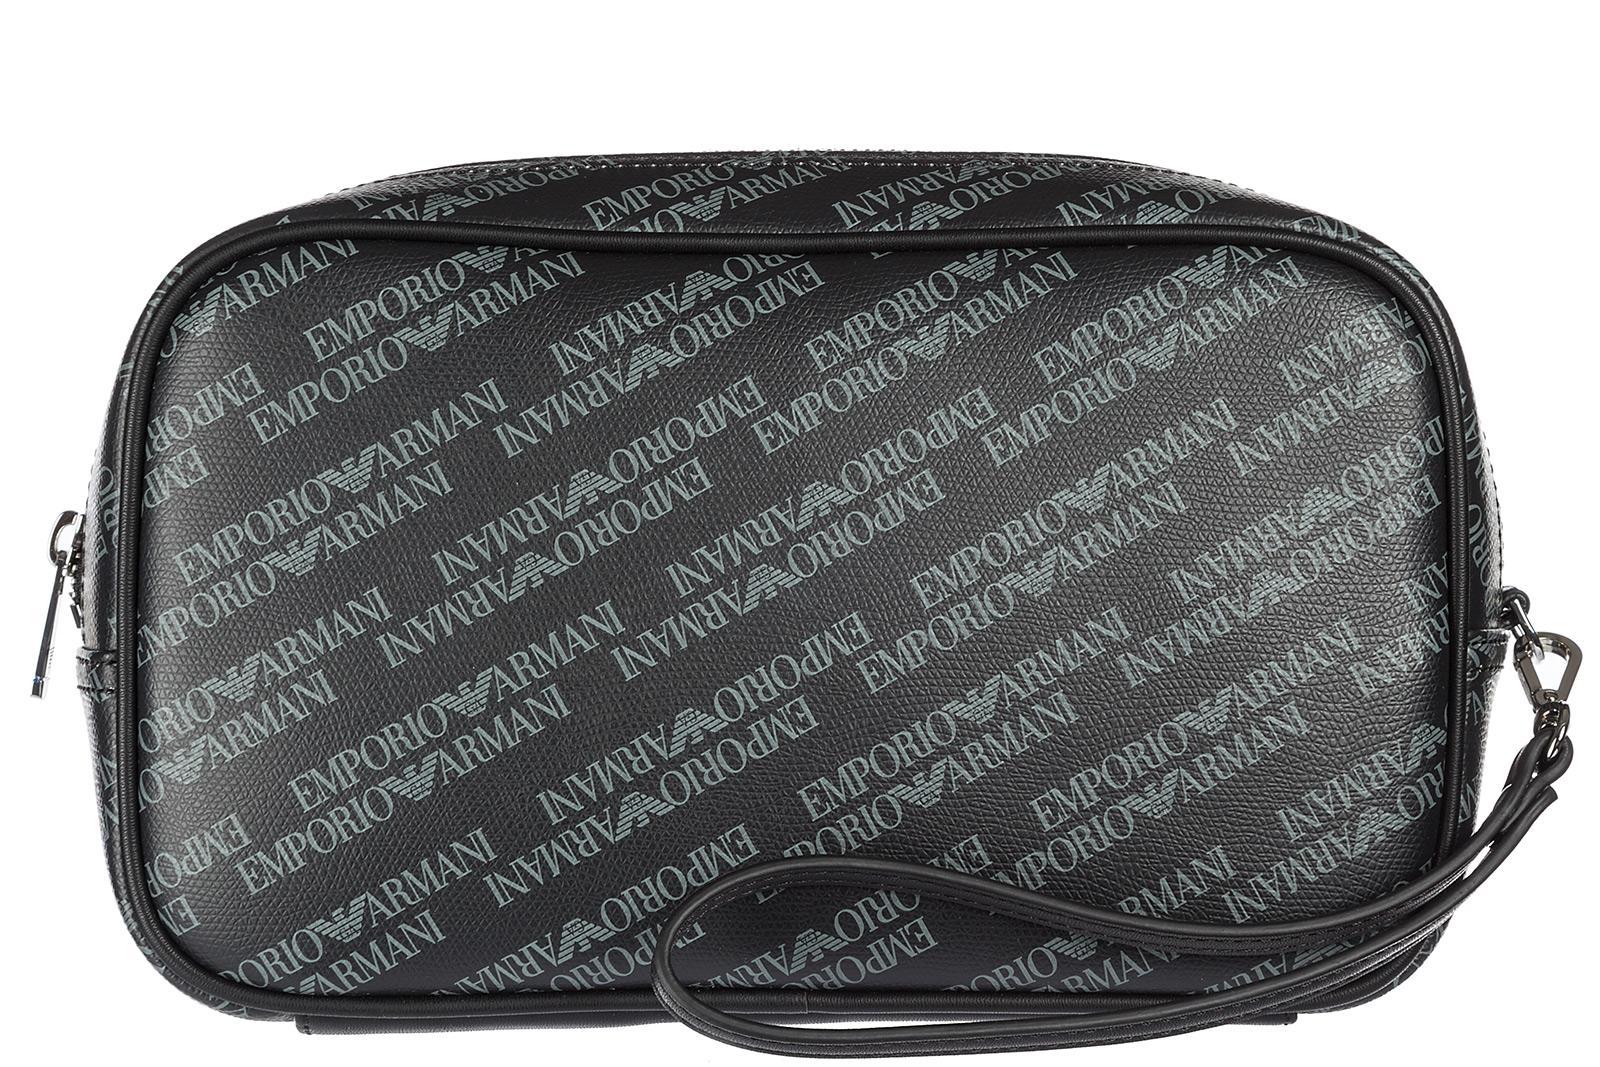 decb7c6cc1 Emporio Armani Men s Travel Toiletries Beauty Case Wash Bag In Black ...